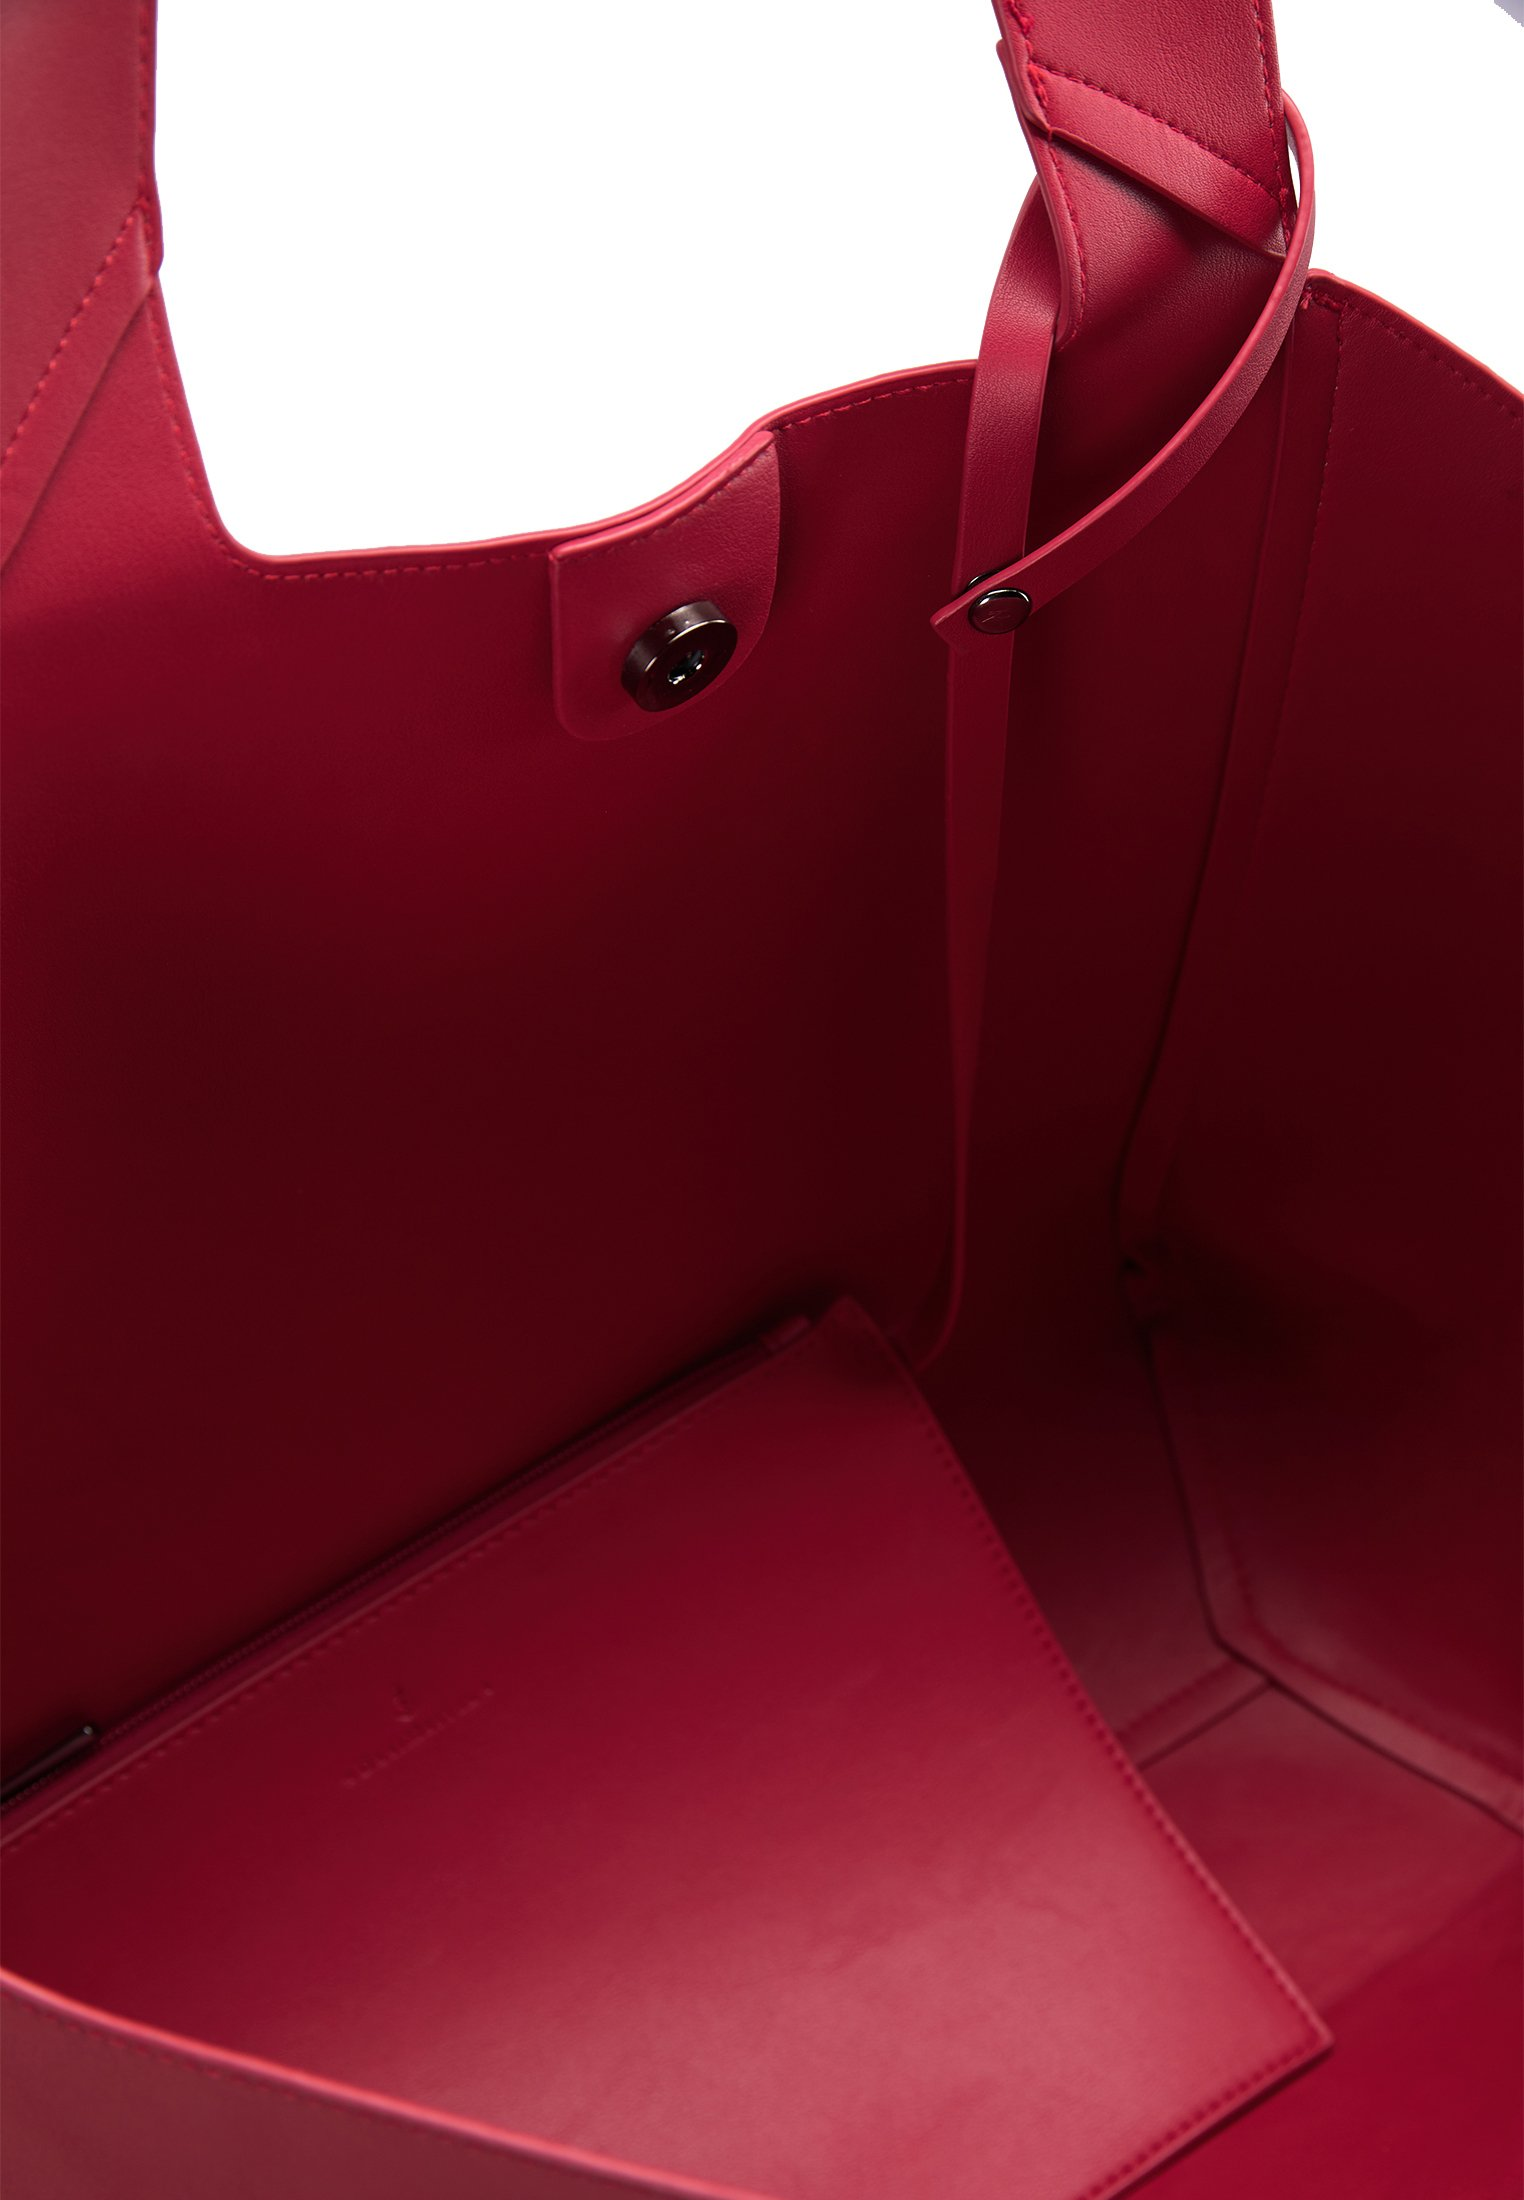 Visit New Limit Discount Accessories DreiMaster Tote bag red GCV2CQexg CT2Of11kV